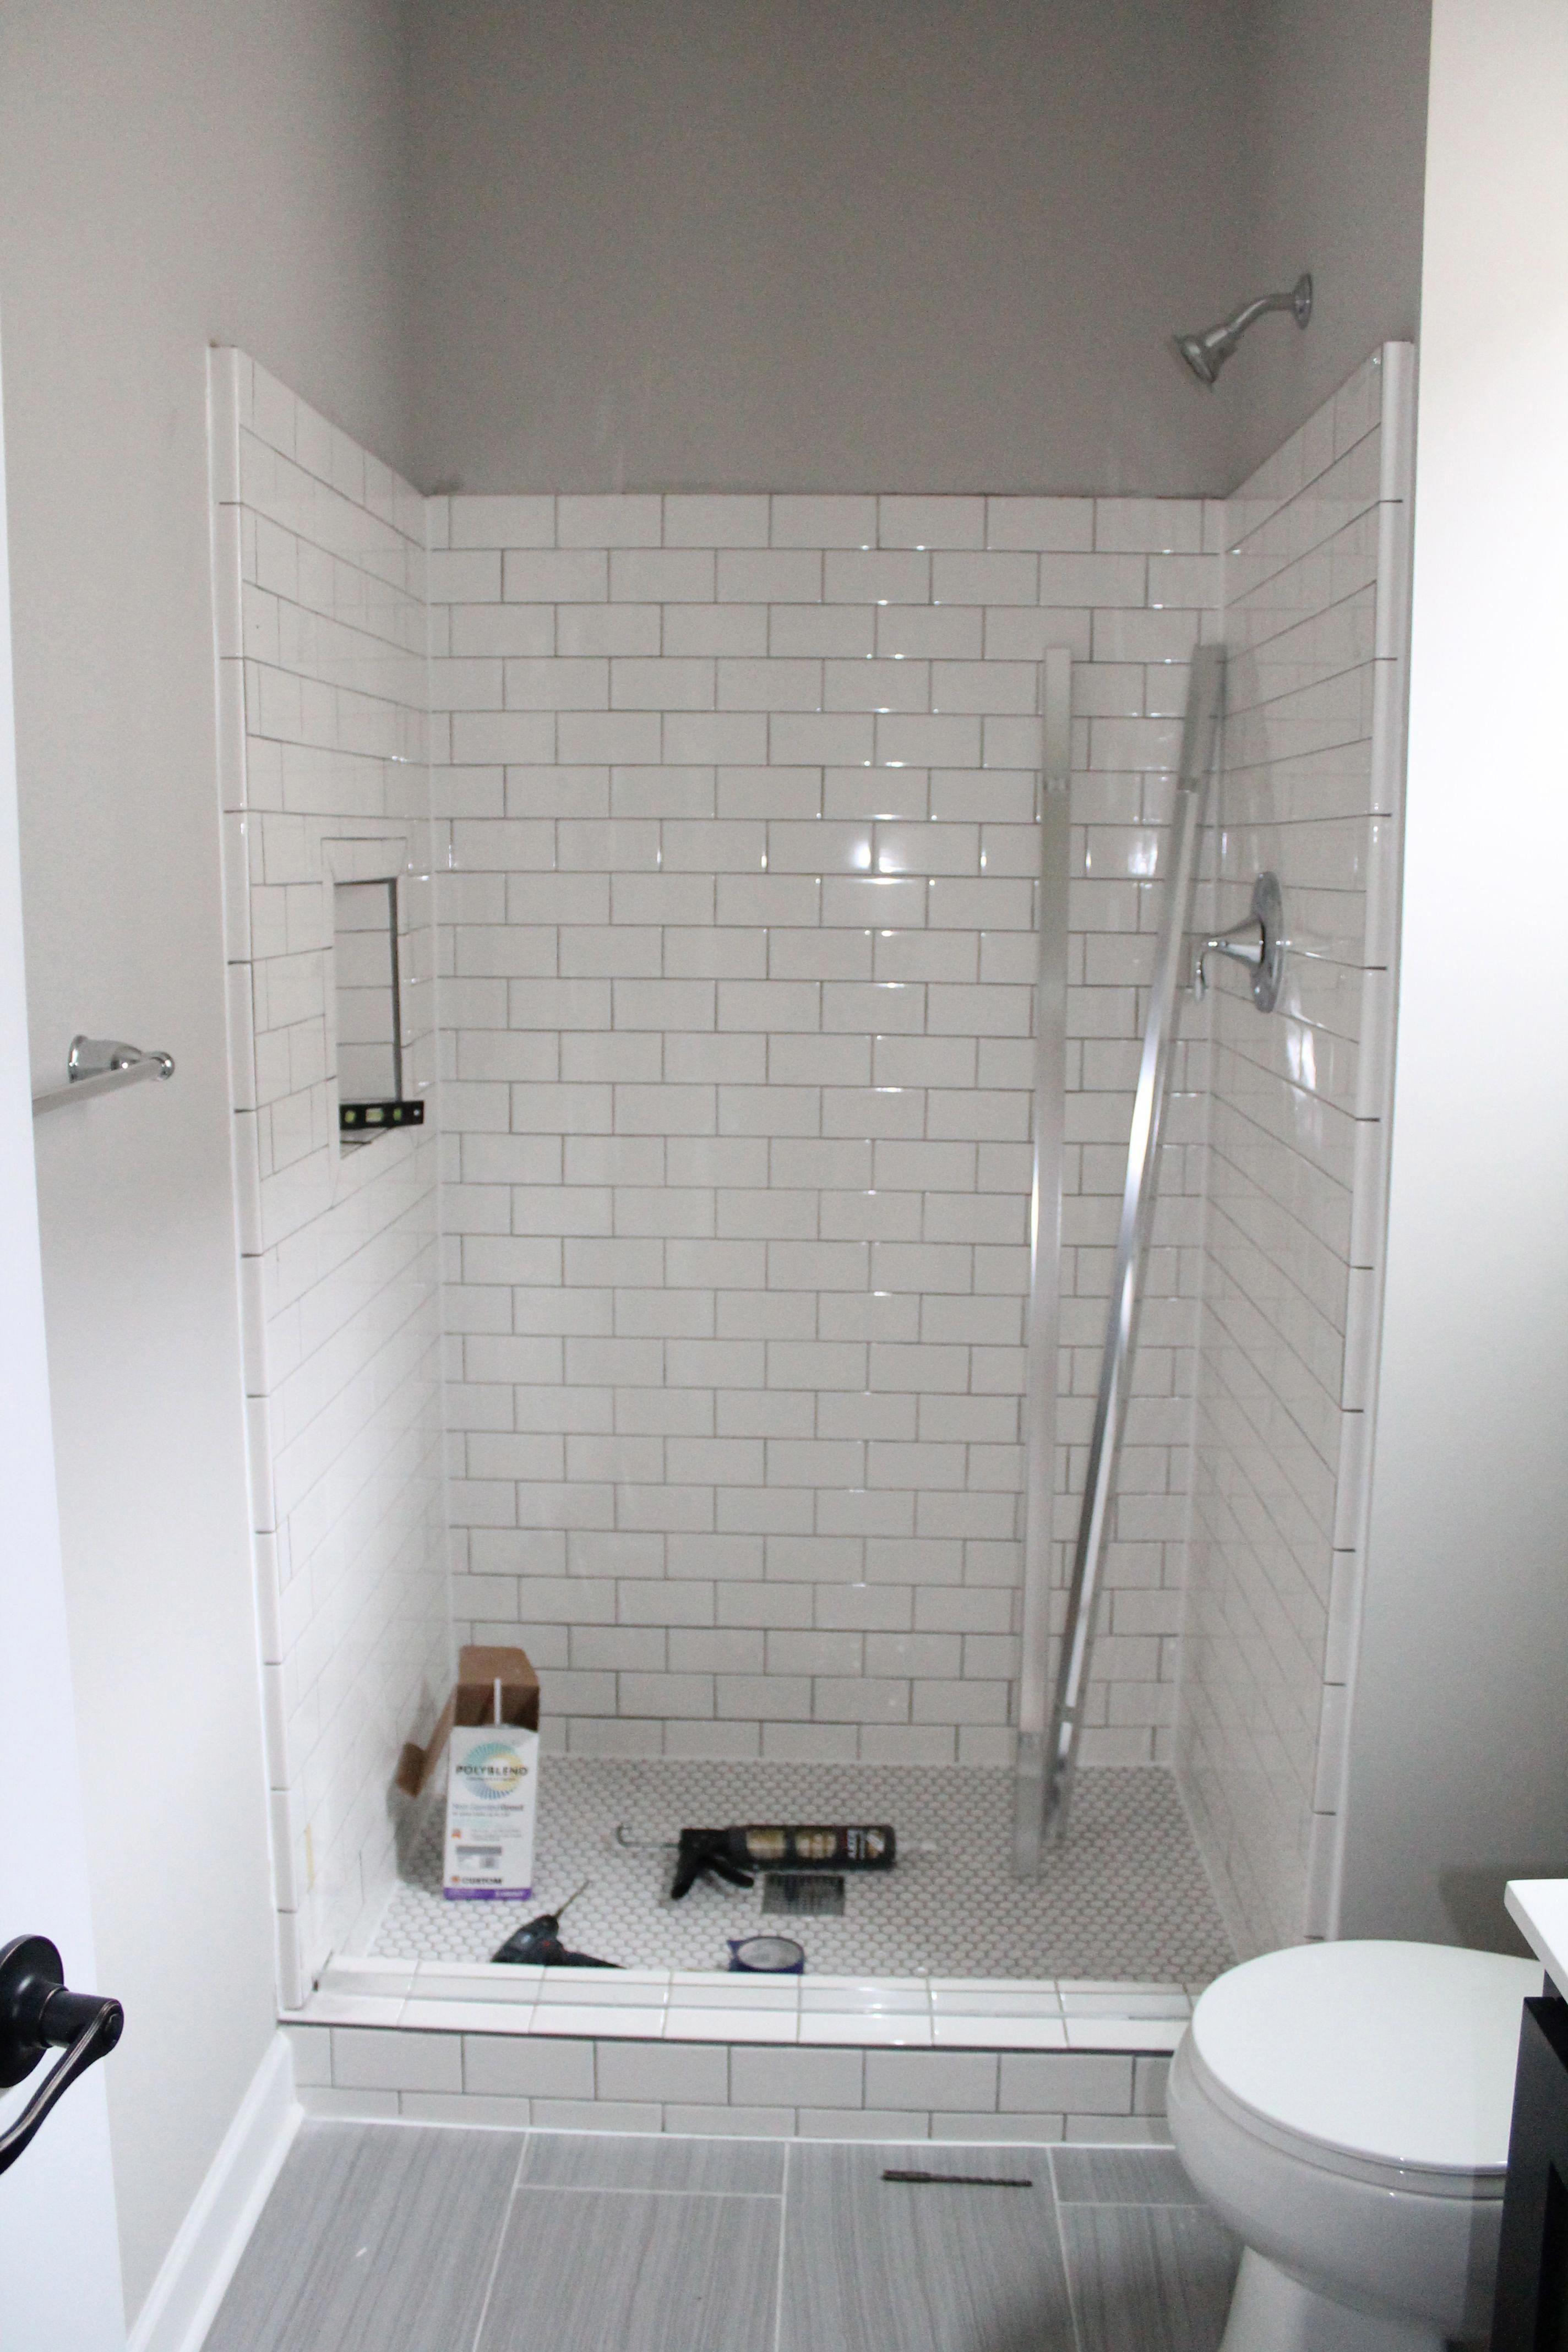 Bathroom Tile Ideas Tile Bathroom Remodel Tags Bathroom Tile Ideas Shower Bat Bathroom Remodel Cost White Subway Tile Bathroom Small Bathroom Remodel Cost